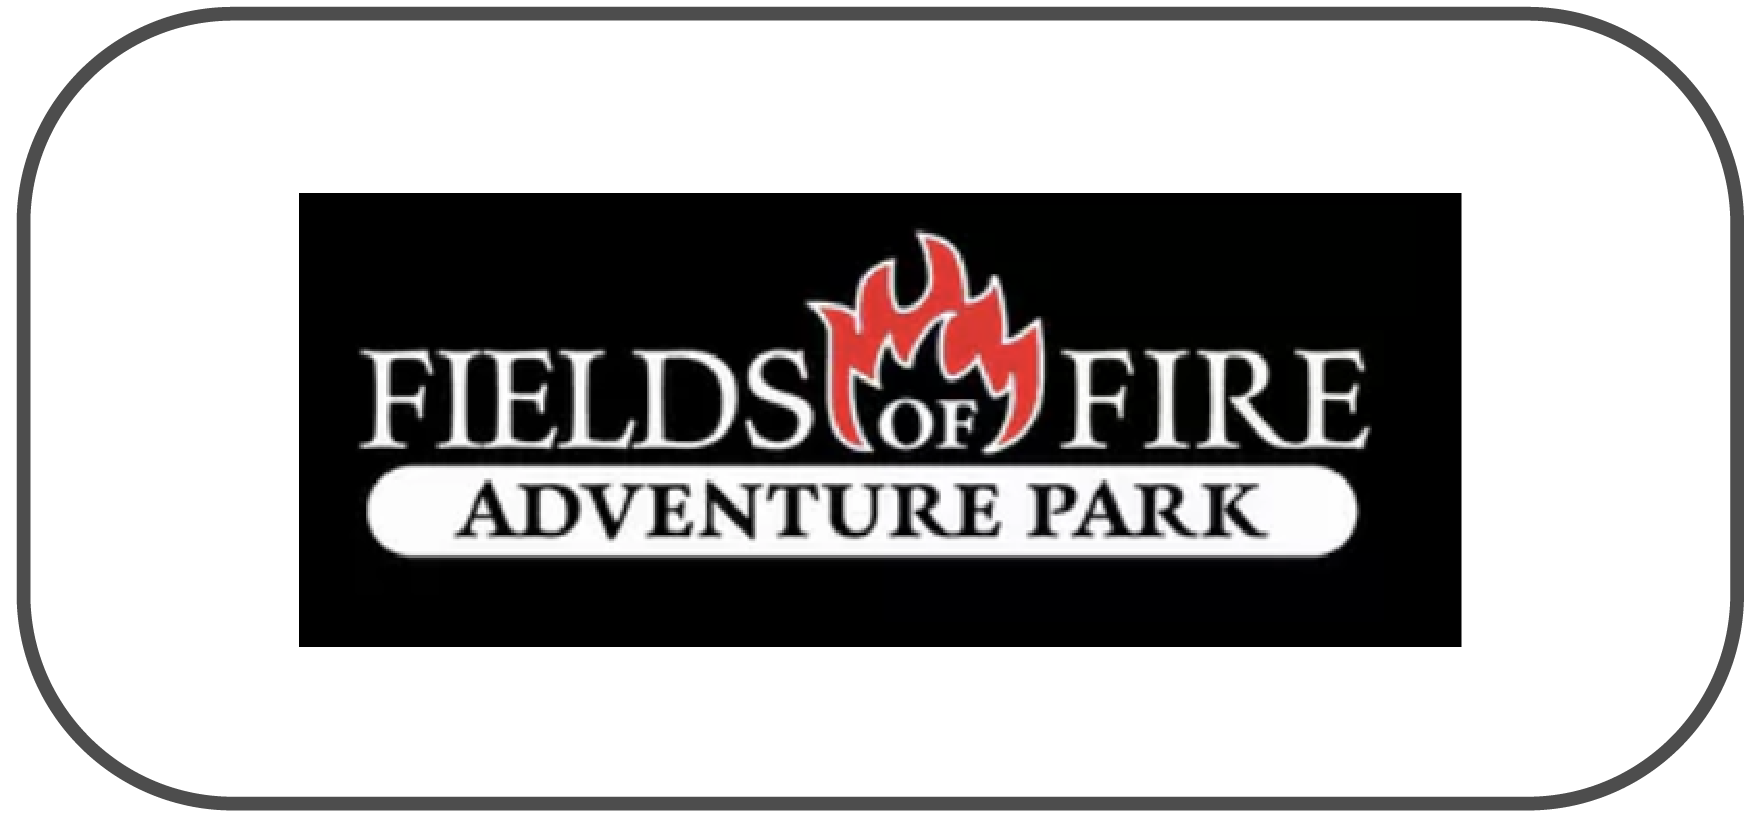 Fields of Fire Adventure Park